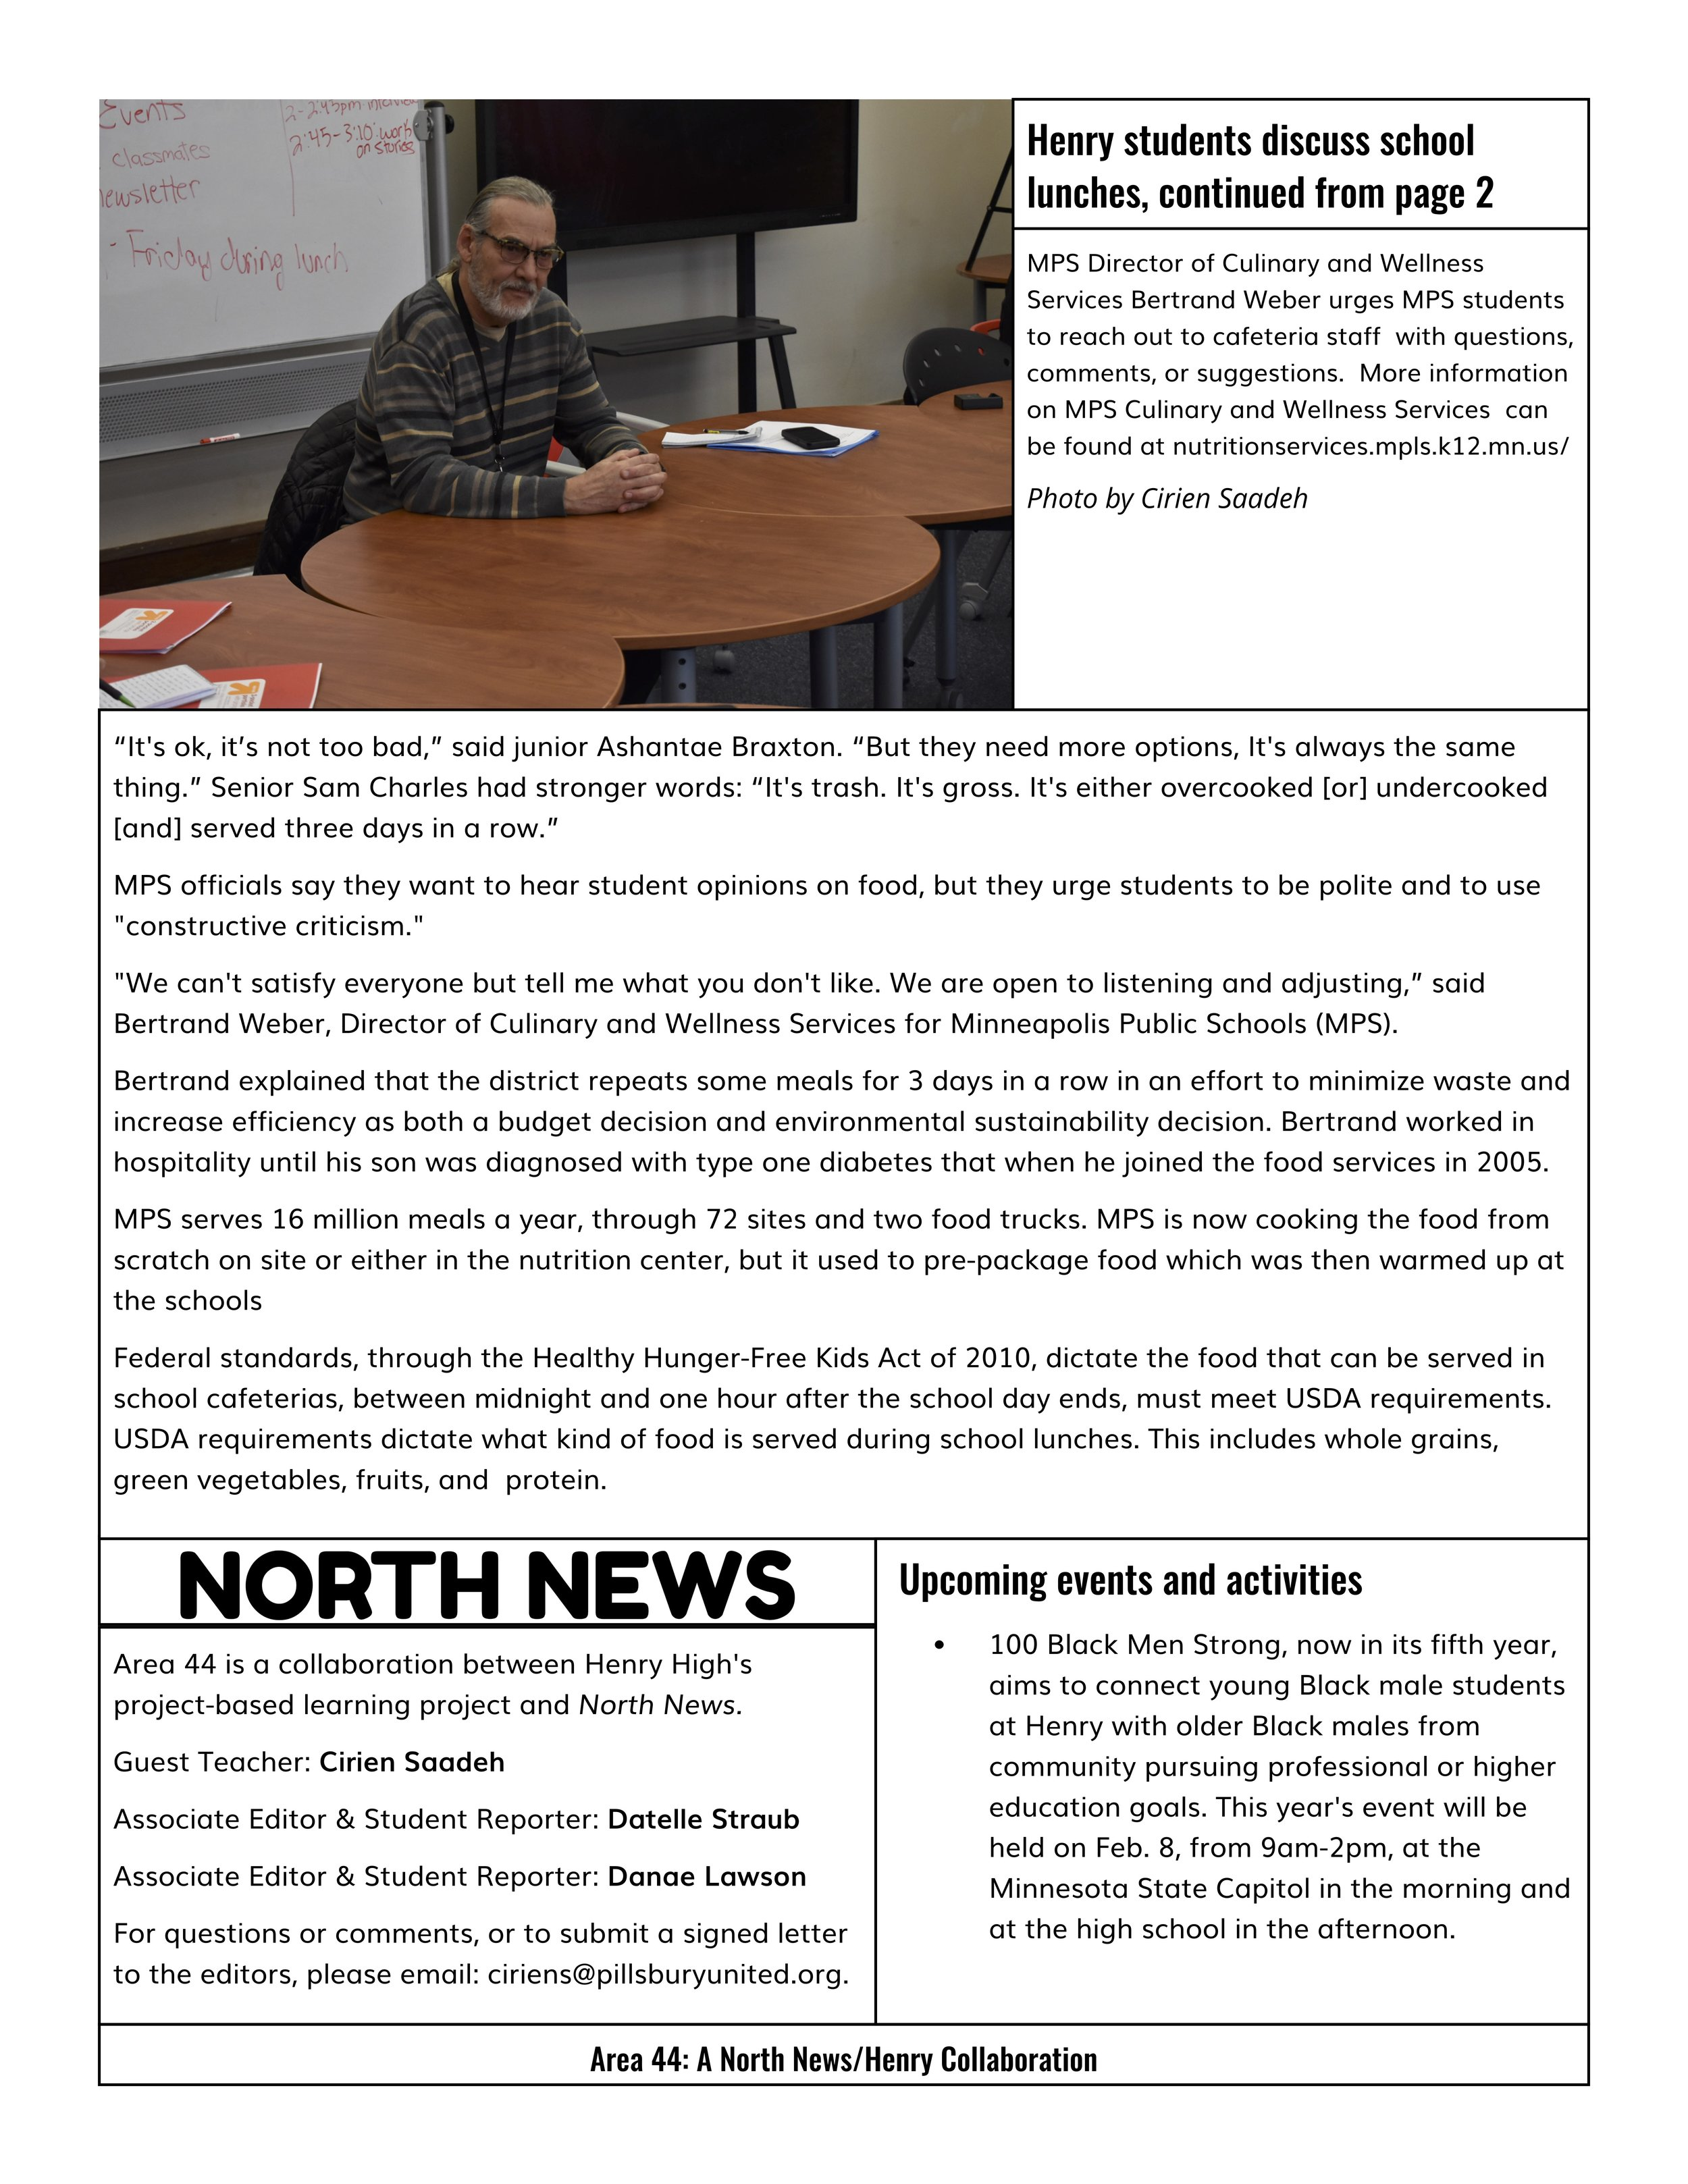 Area 44_ Issue 1_ Final Draft3.jpg